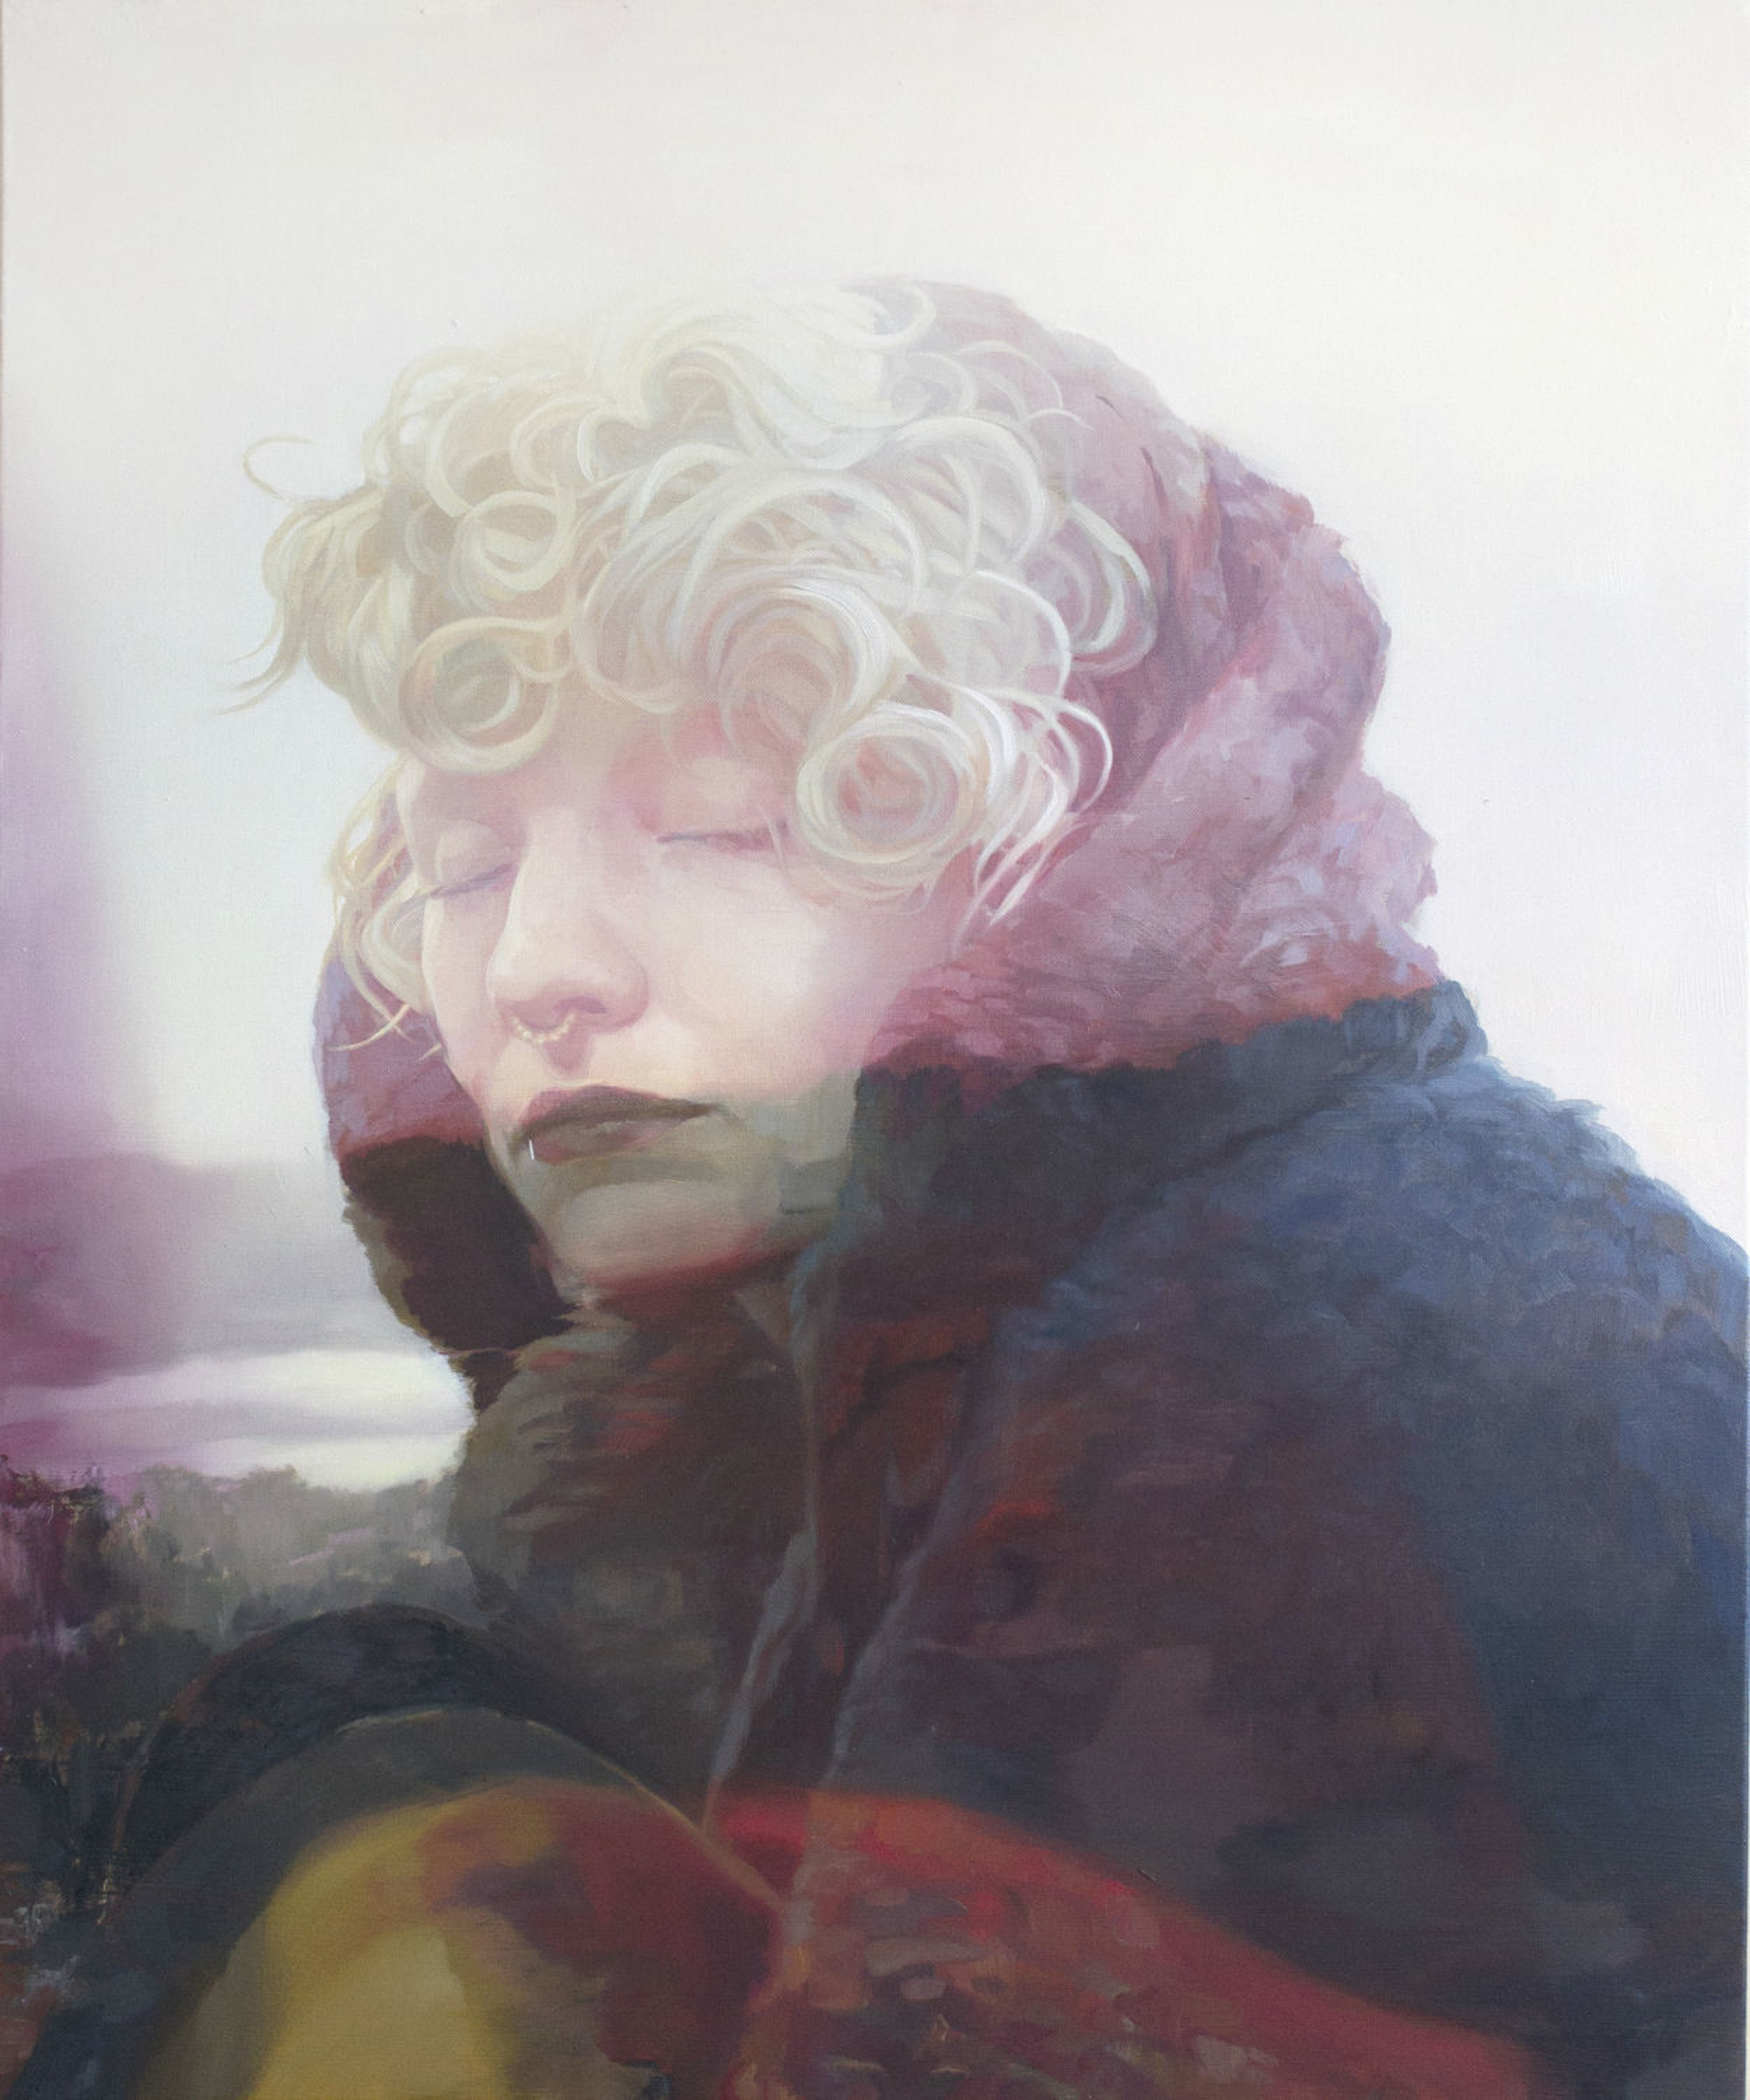 Loran by Meghan Howland